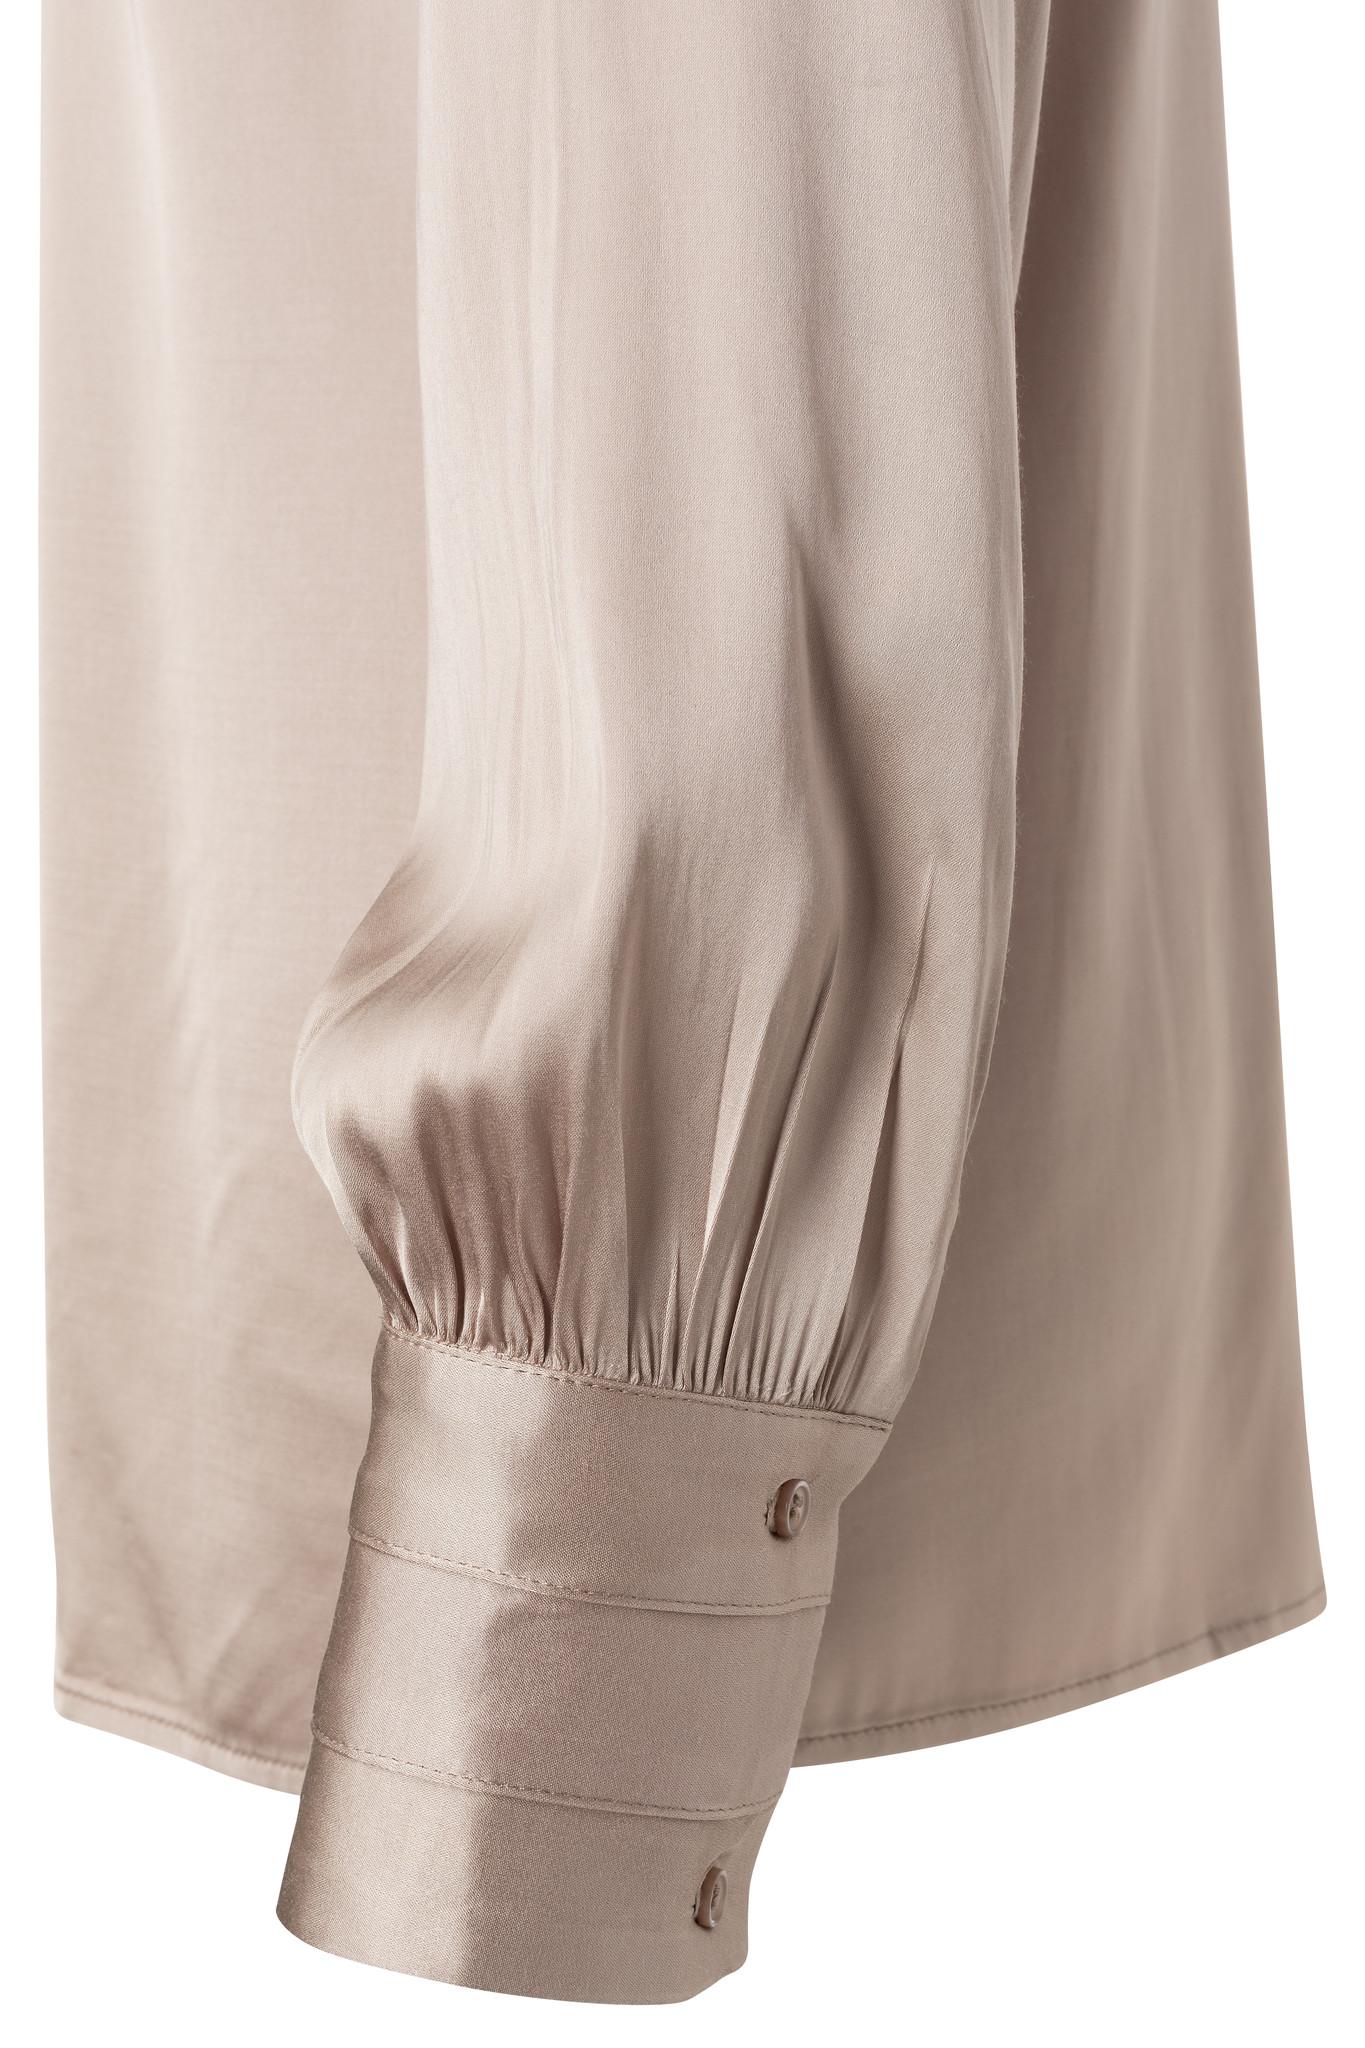 yaya Satin shirt detailed 1101195-111-2